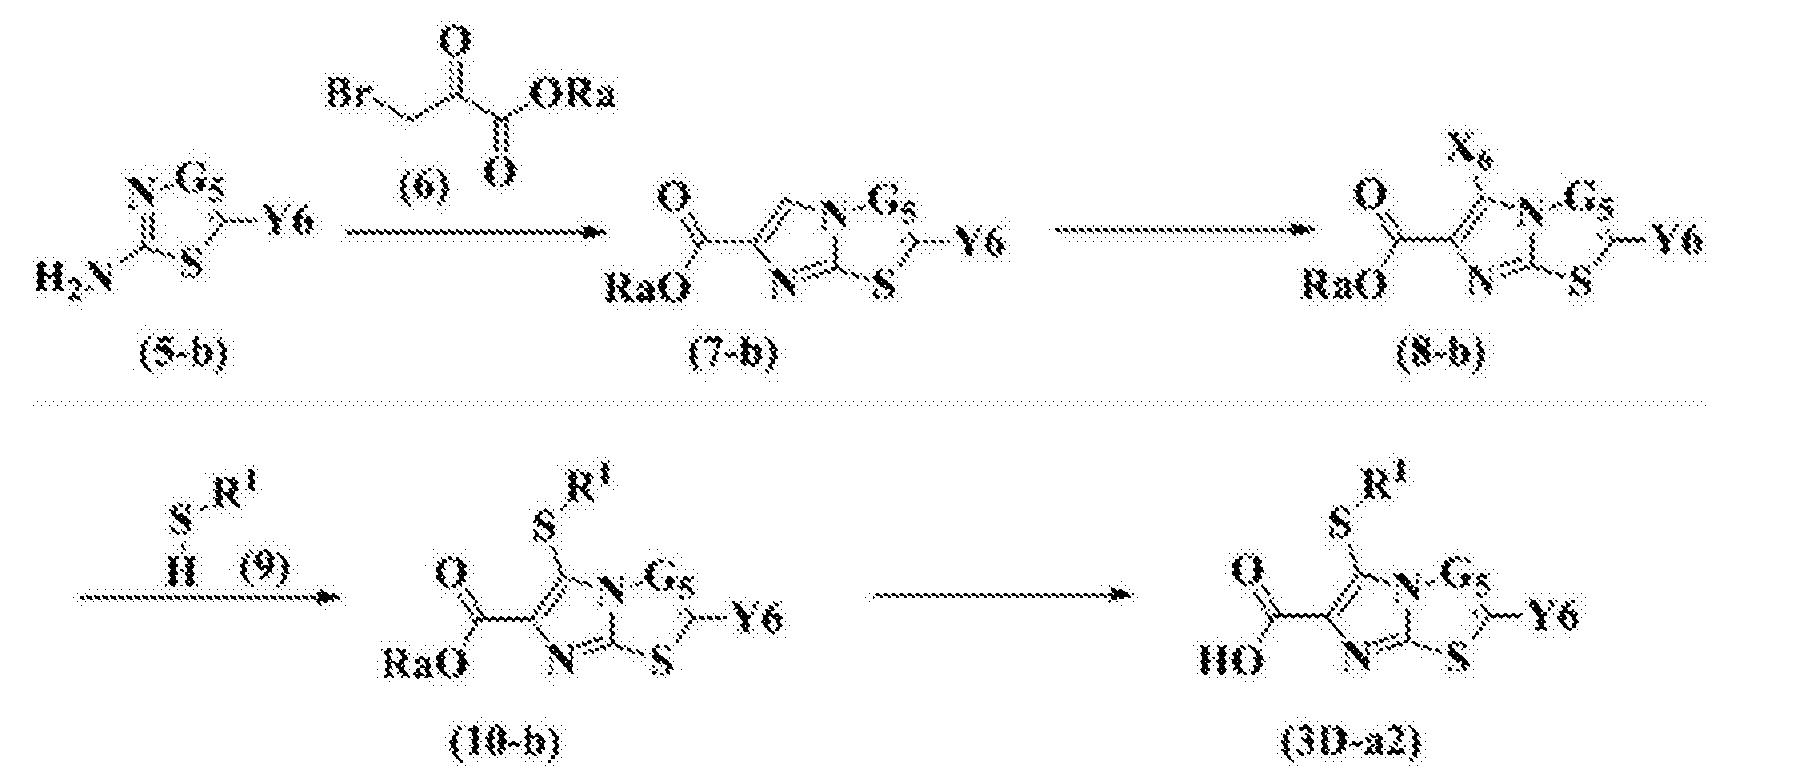 CN107207506A - 稠合杂环化合物和有害生物防除剂- Google Patents e086cb5779f6